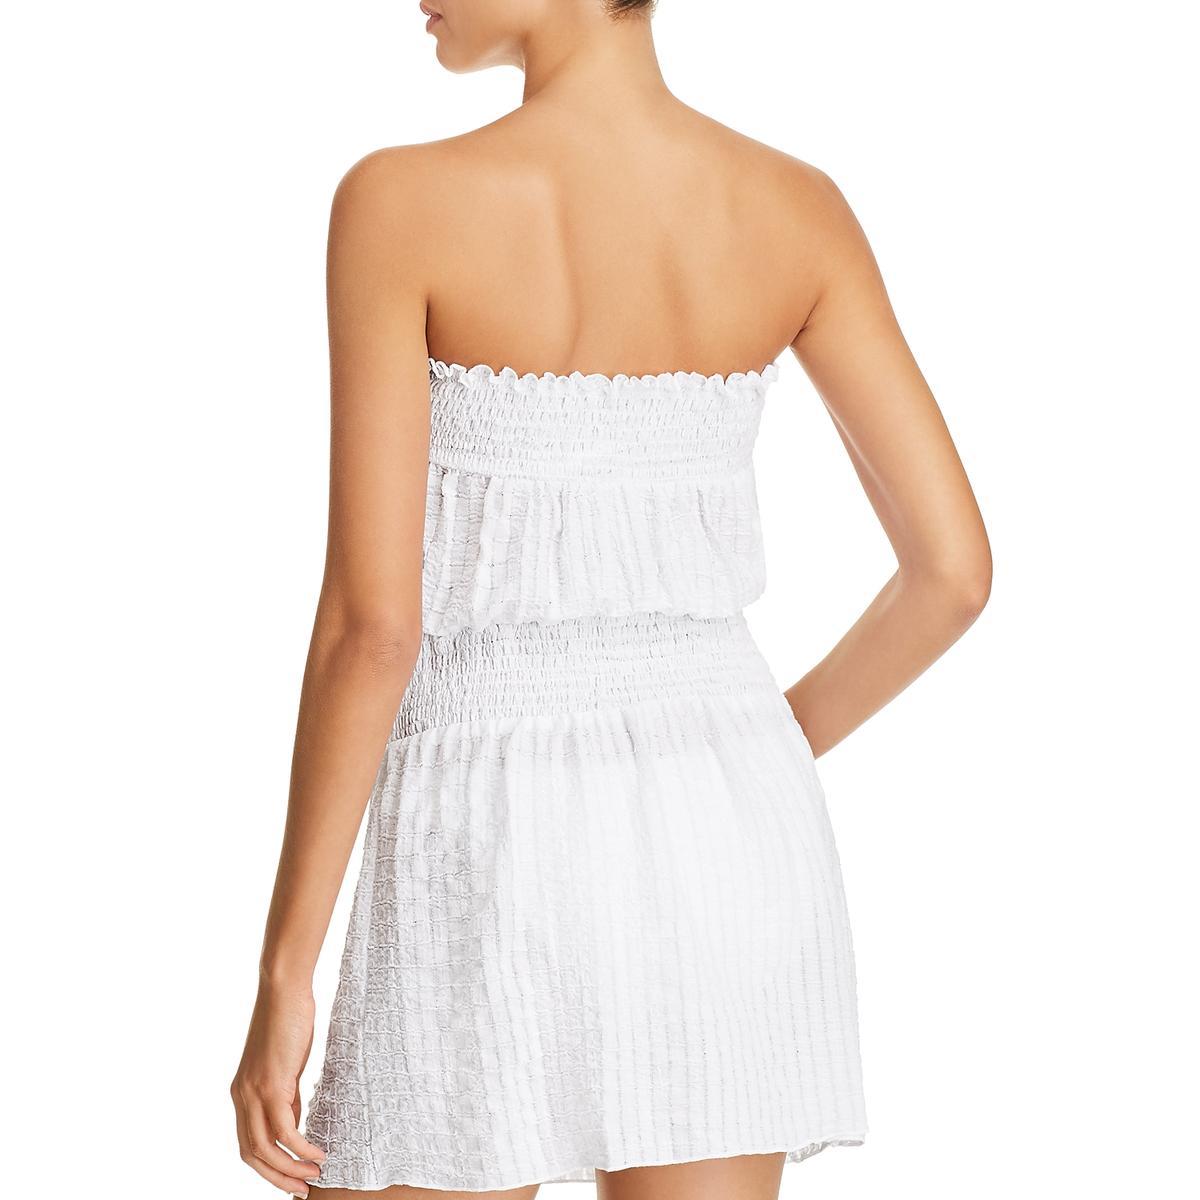 Soluna Womens Cotton Smocked Mini Dress Swim Cover-Up BHFO 3972